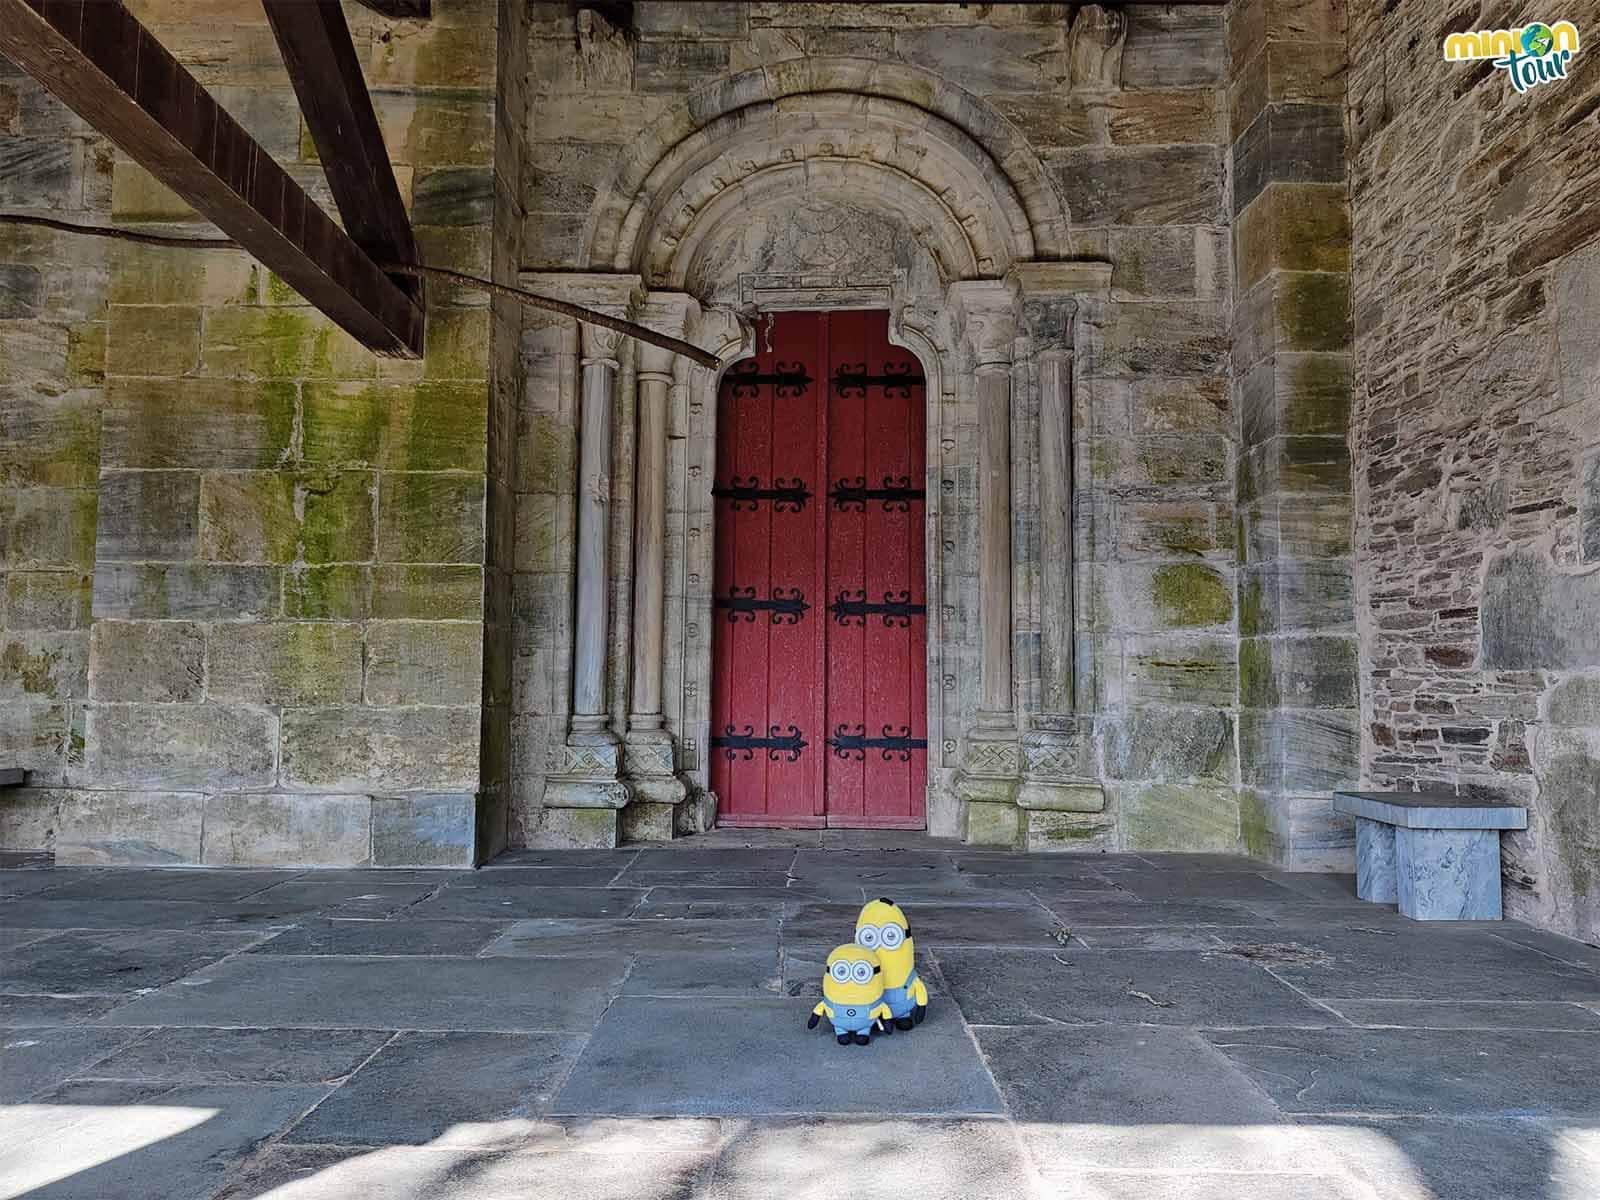 Vamos a cotillear la puerta lateral de la Iglesia de San Pedro Fiz de Hospital do Incio